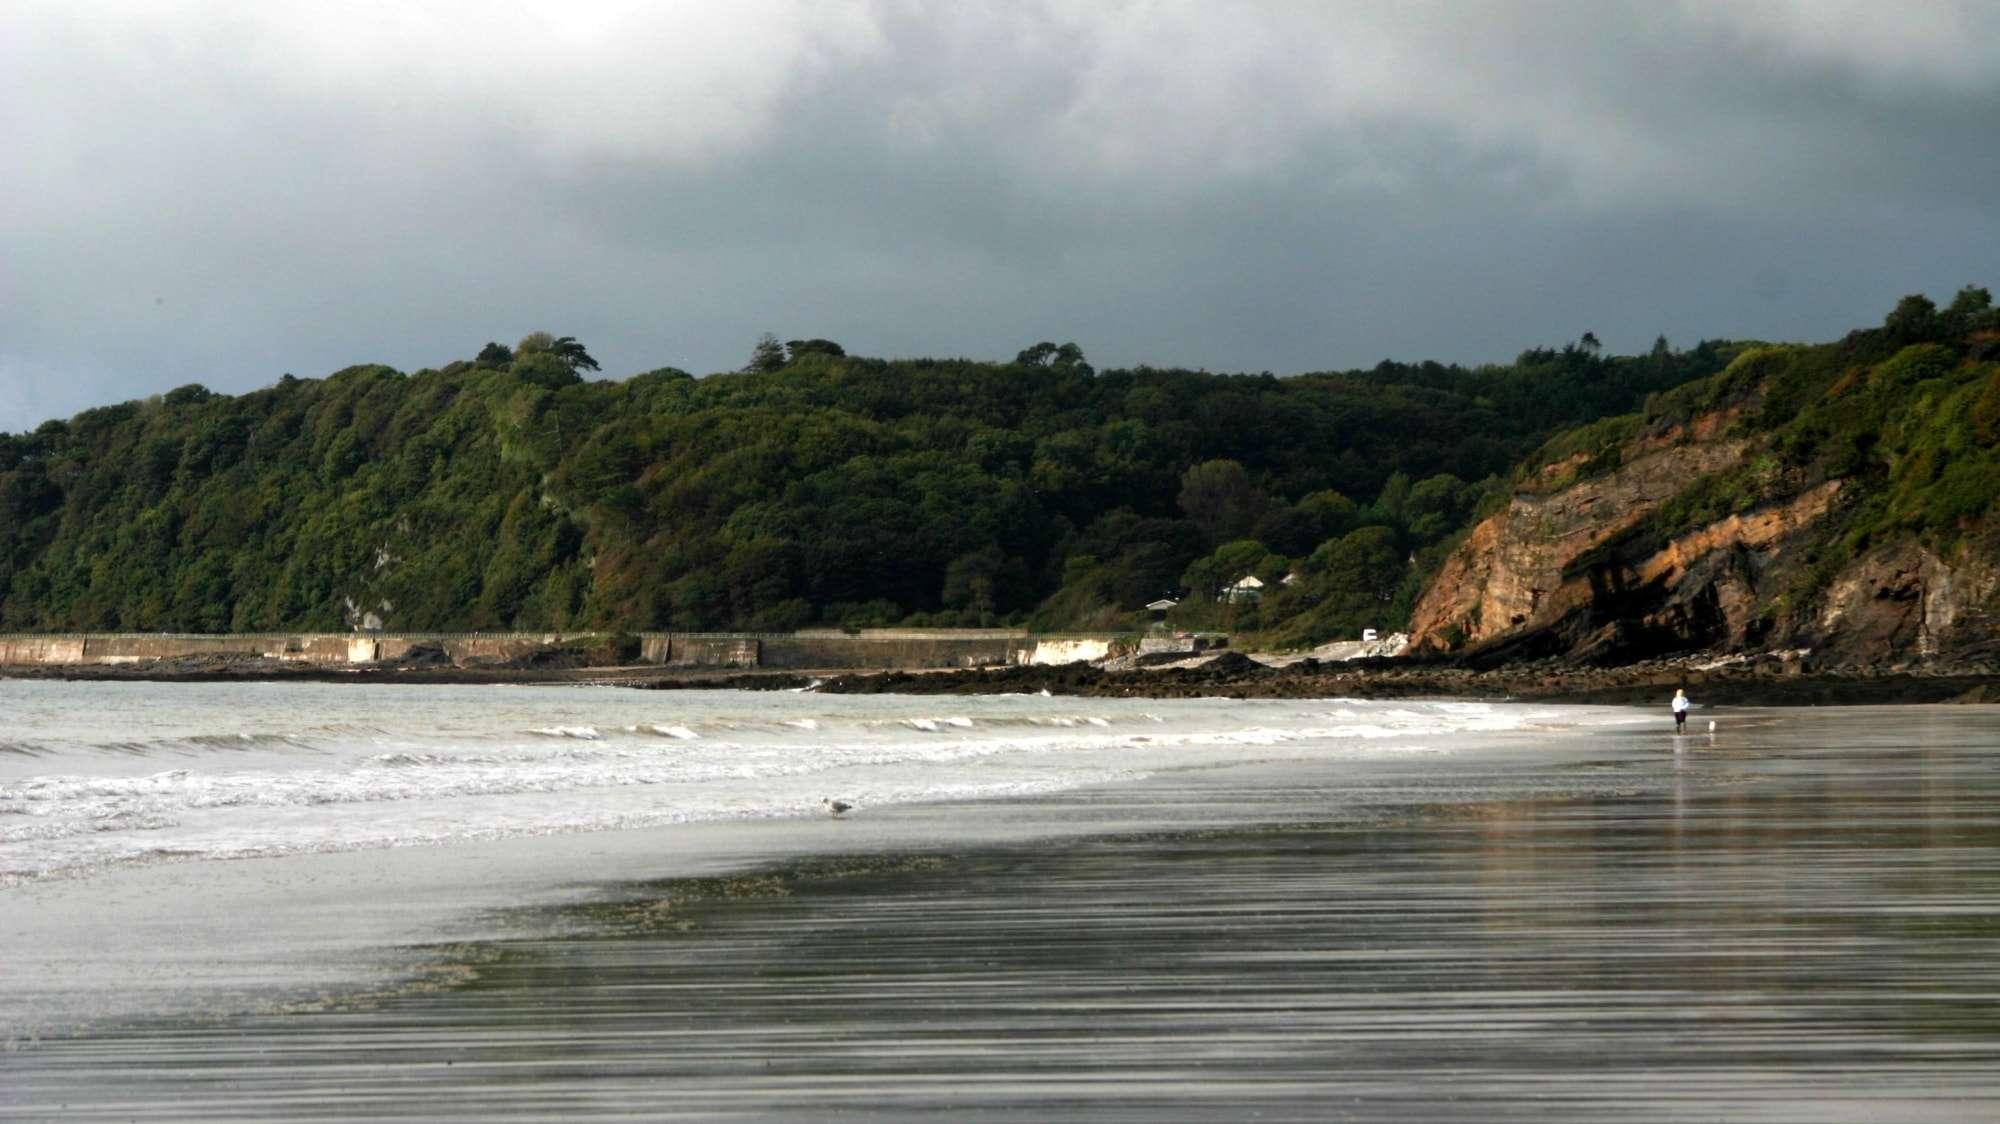 Image of shoreline at Amroth, Cardigan Bay, Wales